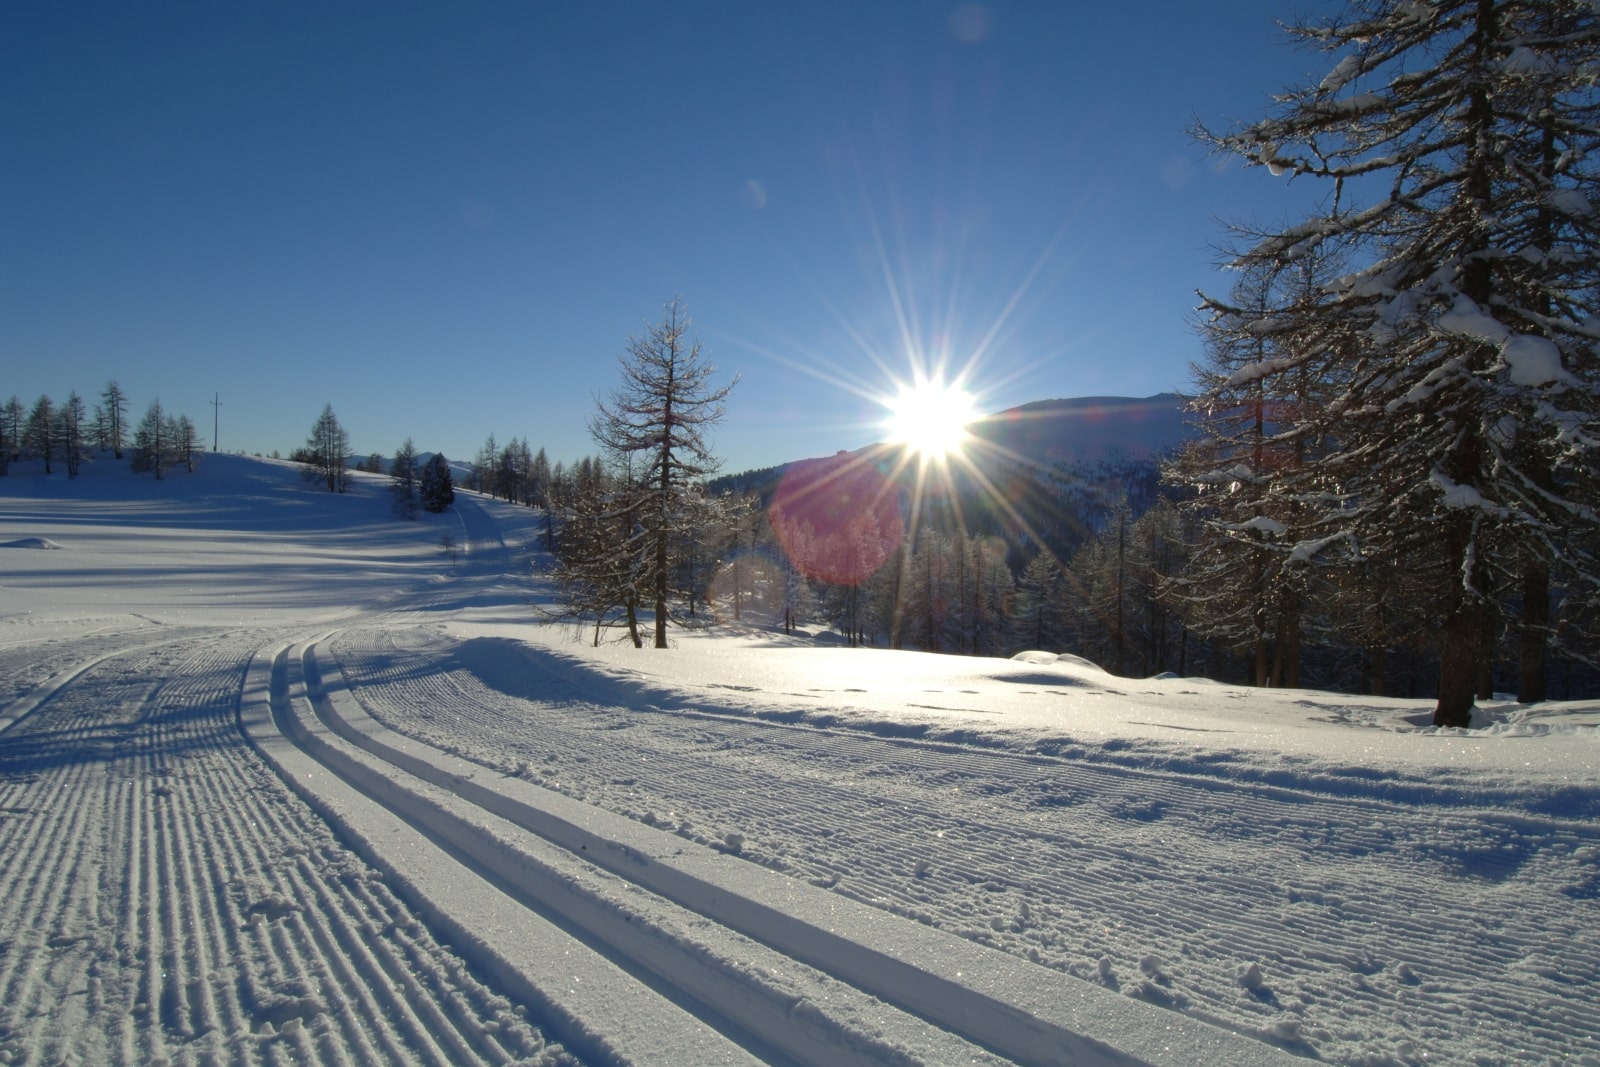 Heidi-Chalet-Falkert-Heidialm-Falkertsee-Ski-Loipe